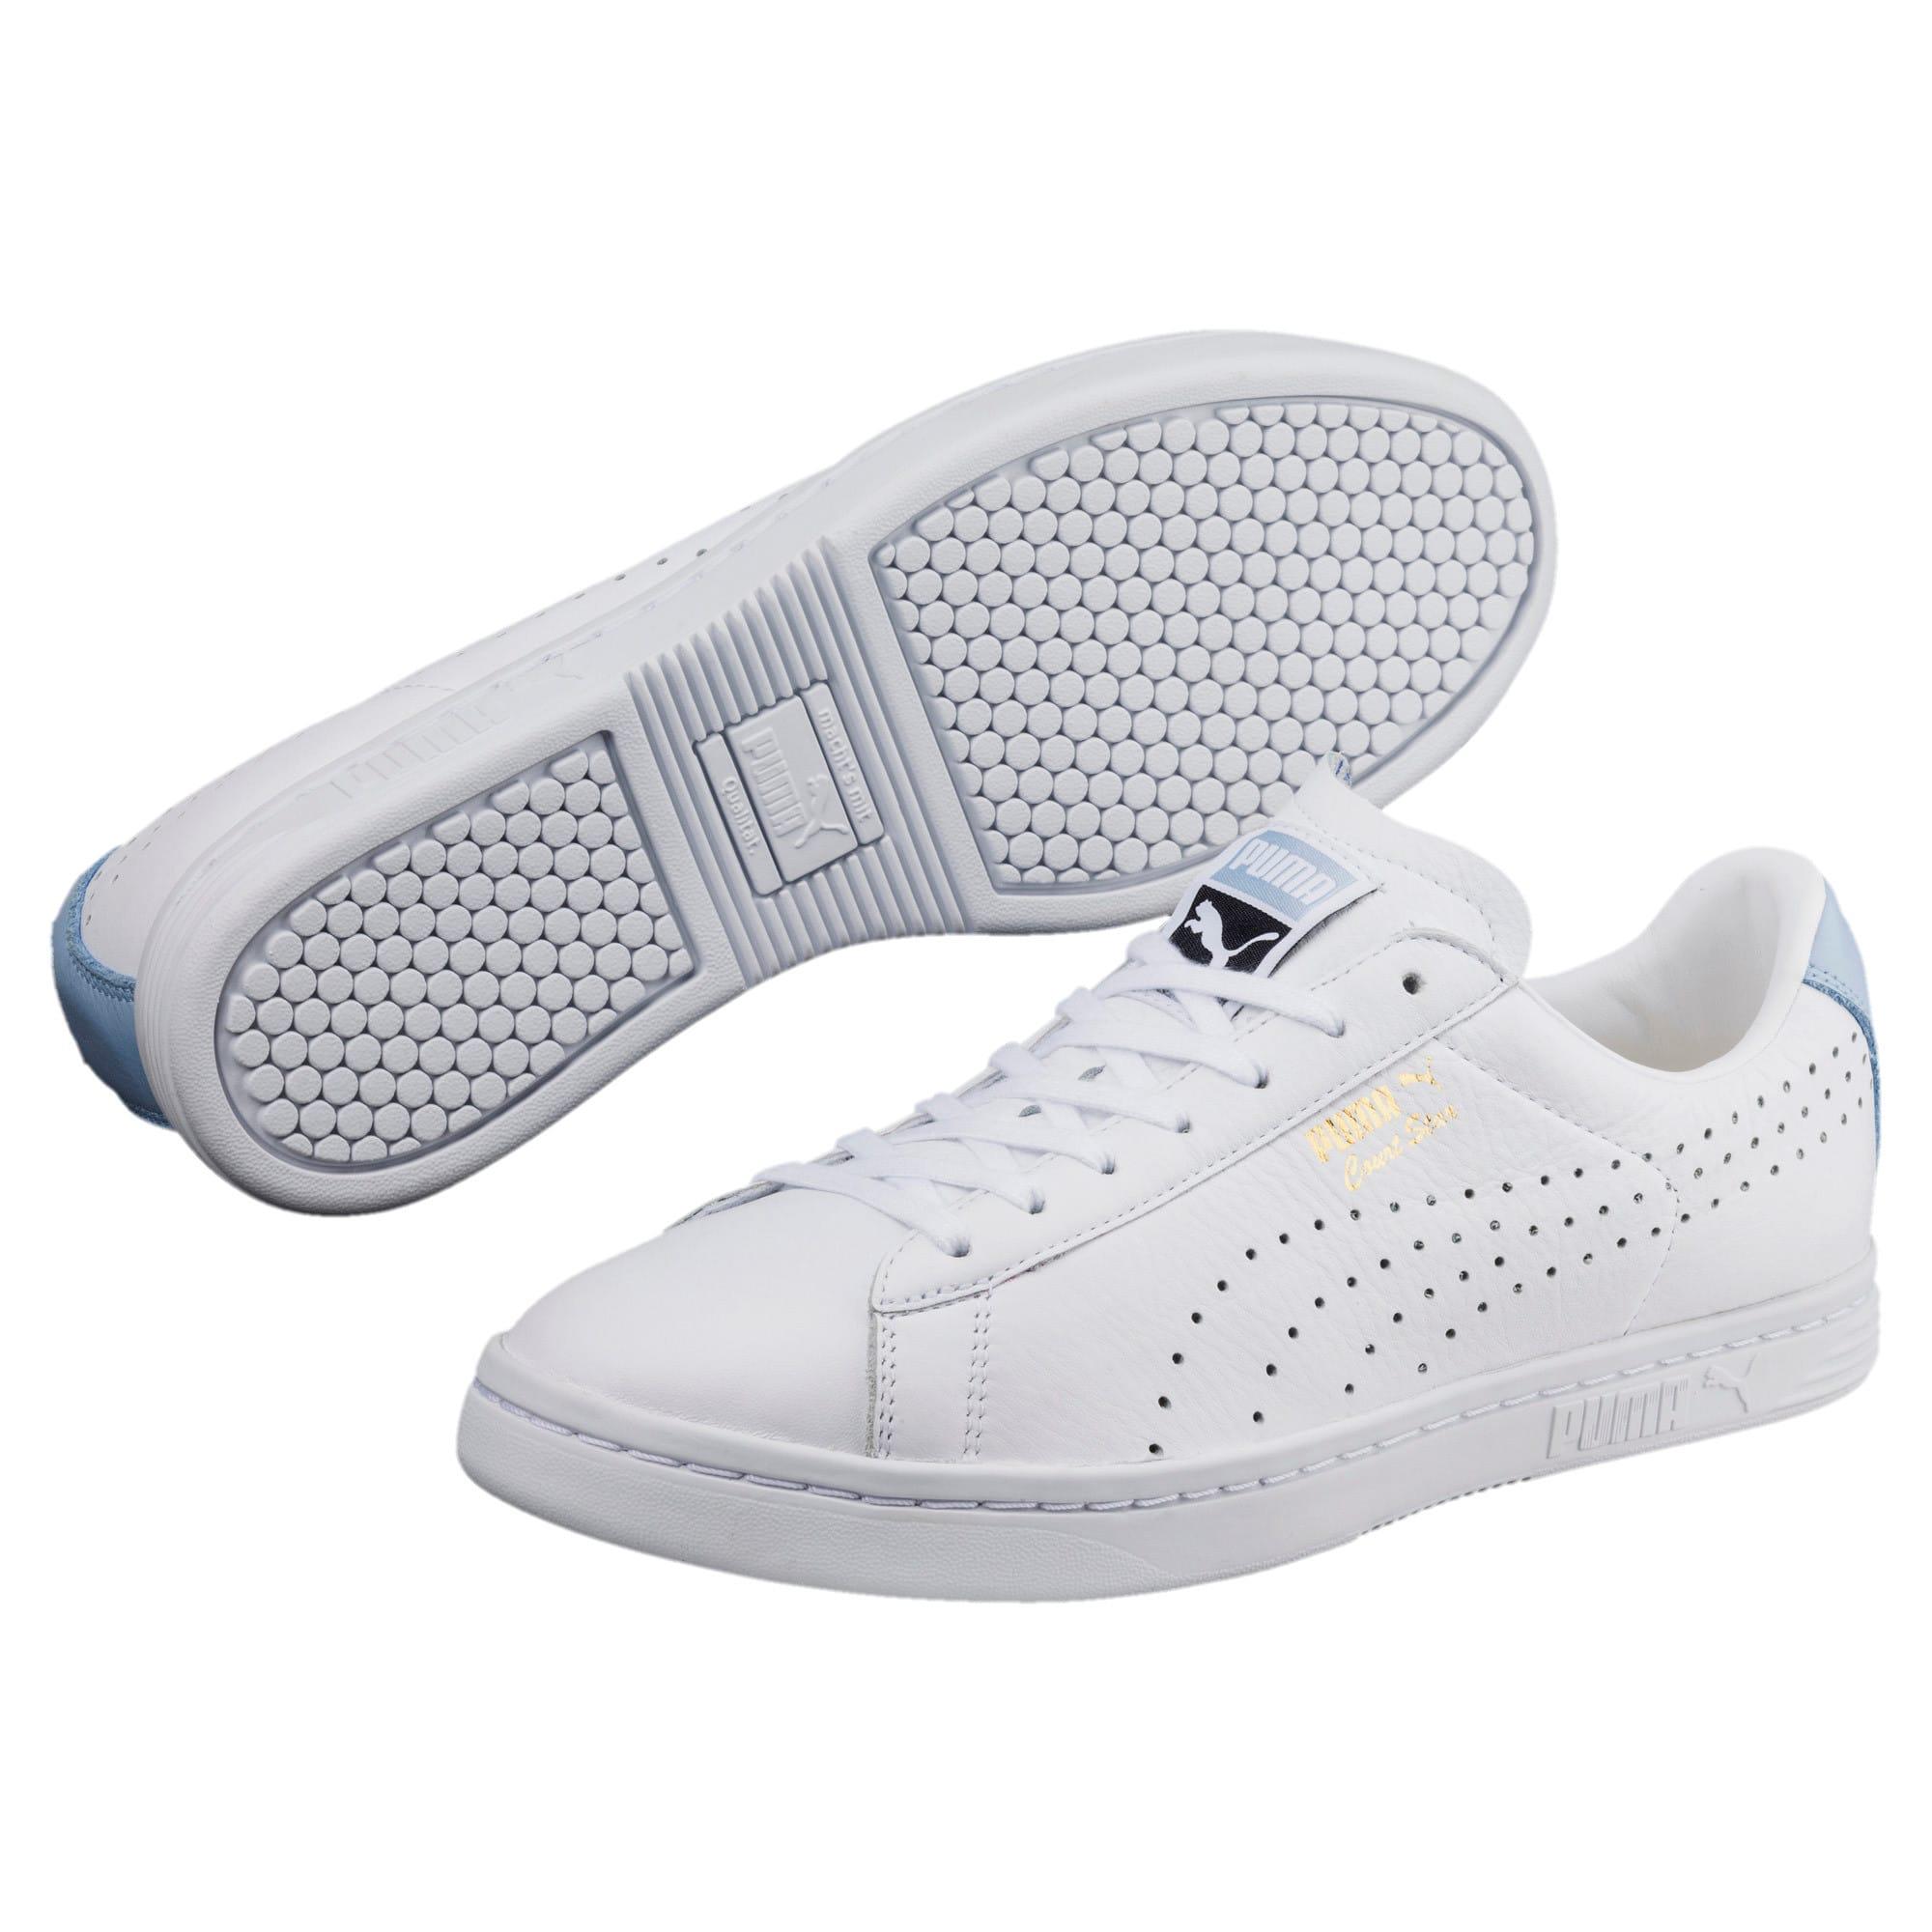 Moderne Puma Schuhe Herren, Puma Court Star NM Weiß